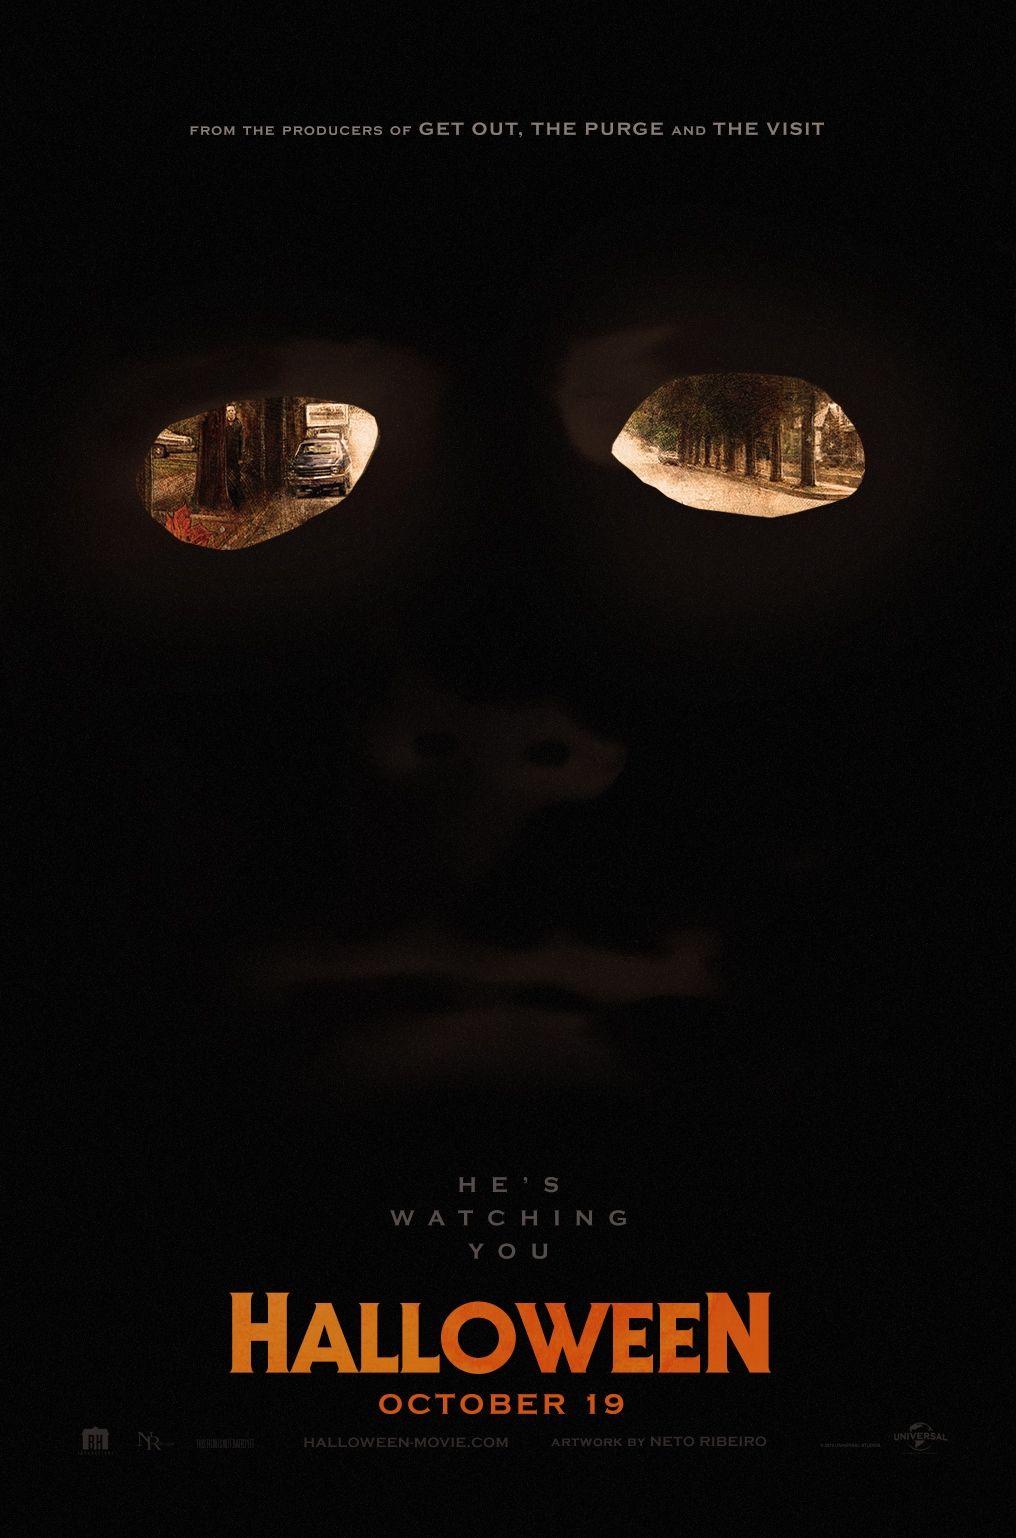 Halloween (2018) [1016 x 1538] Oh The Horror